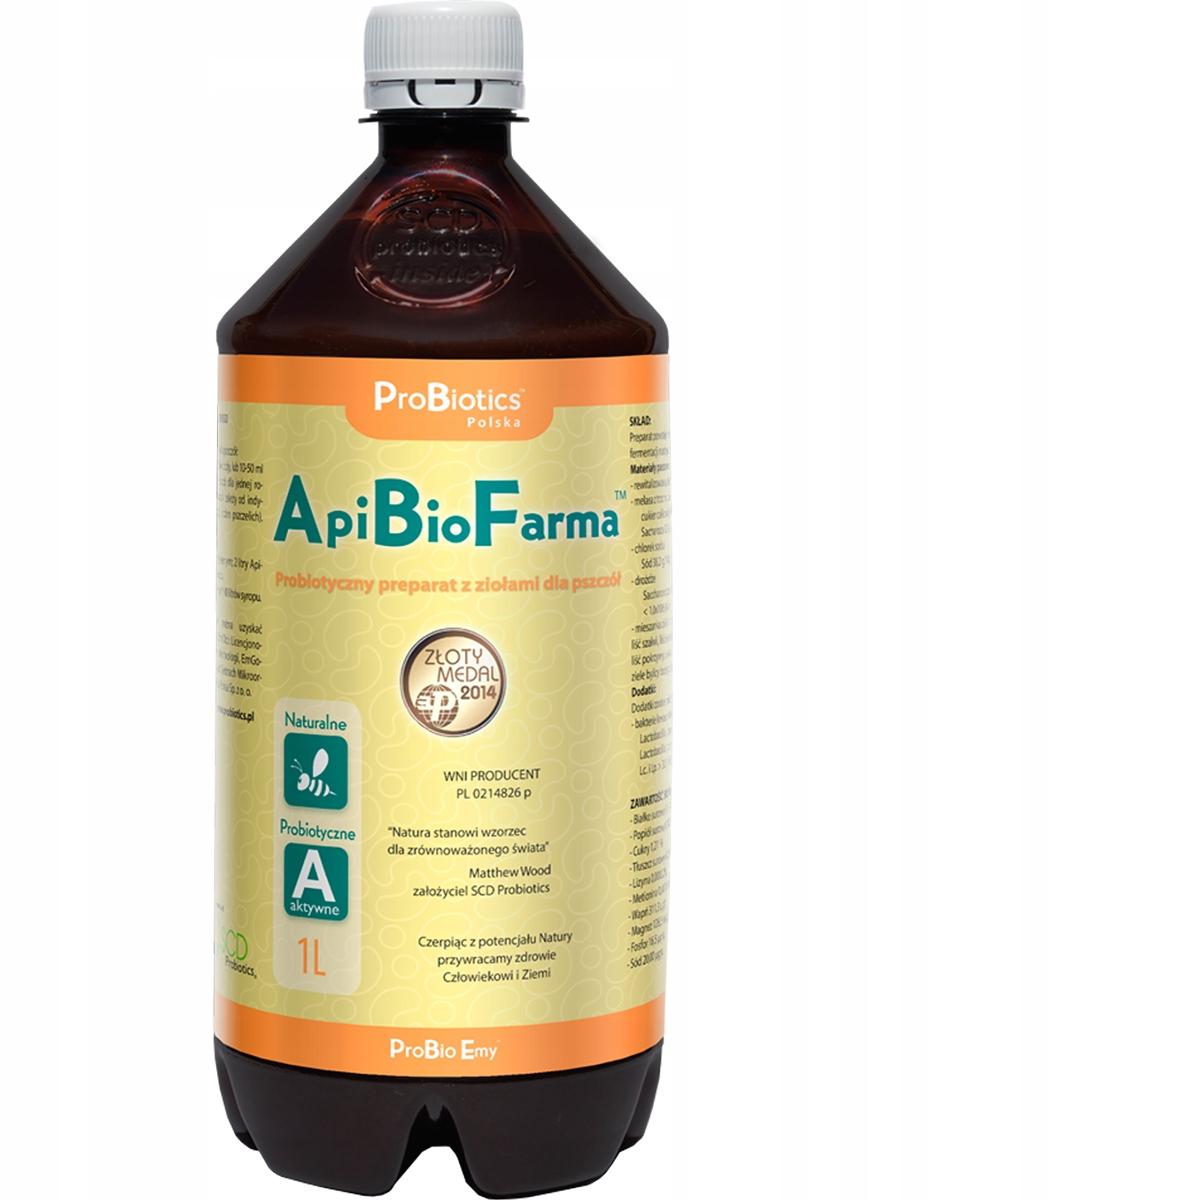 SUPER Probiotyk WZMACNIA pszczoły - ApiBioFarma 1L